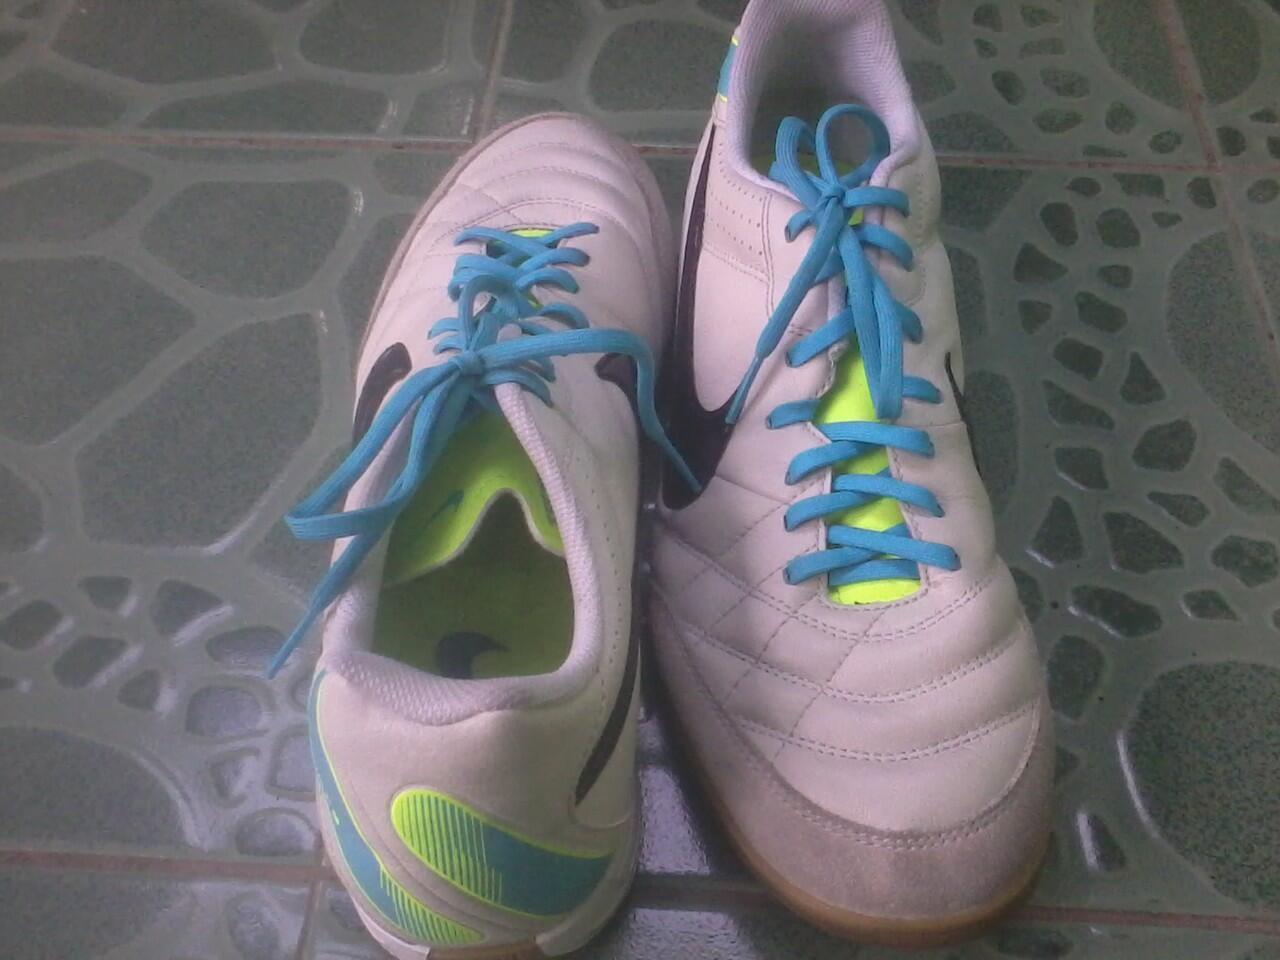 Sepatu Futsal Nike Tiempo Natural IV leather (kulit asli) size 45 (fit 44) #Nego